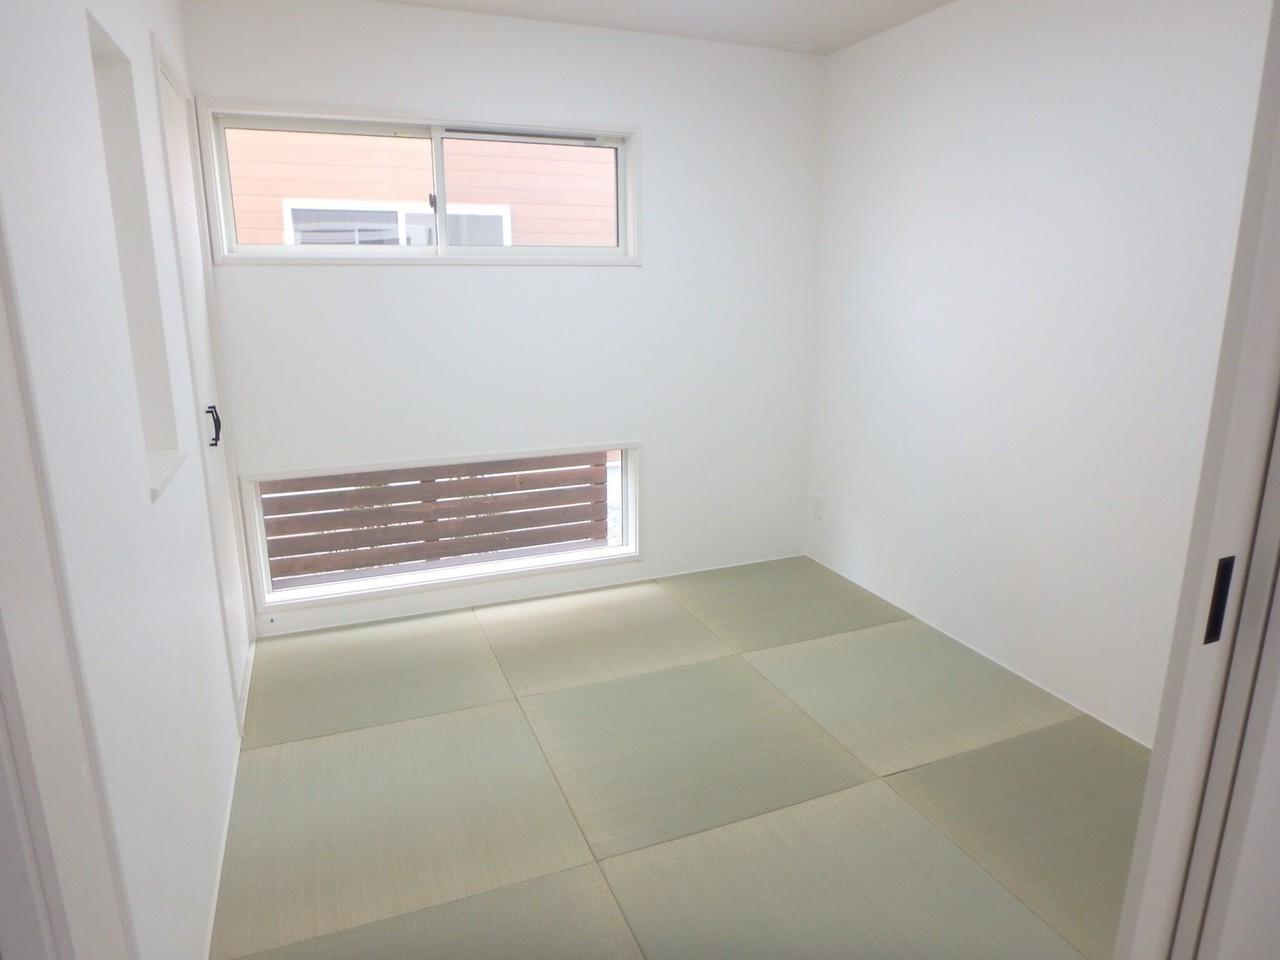 LDKと続き間になっている和室はリビング雰囲気を損なわない琉球畳です。